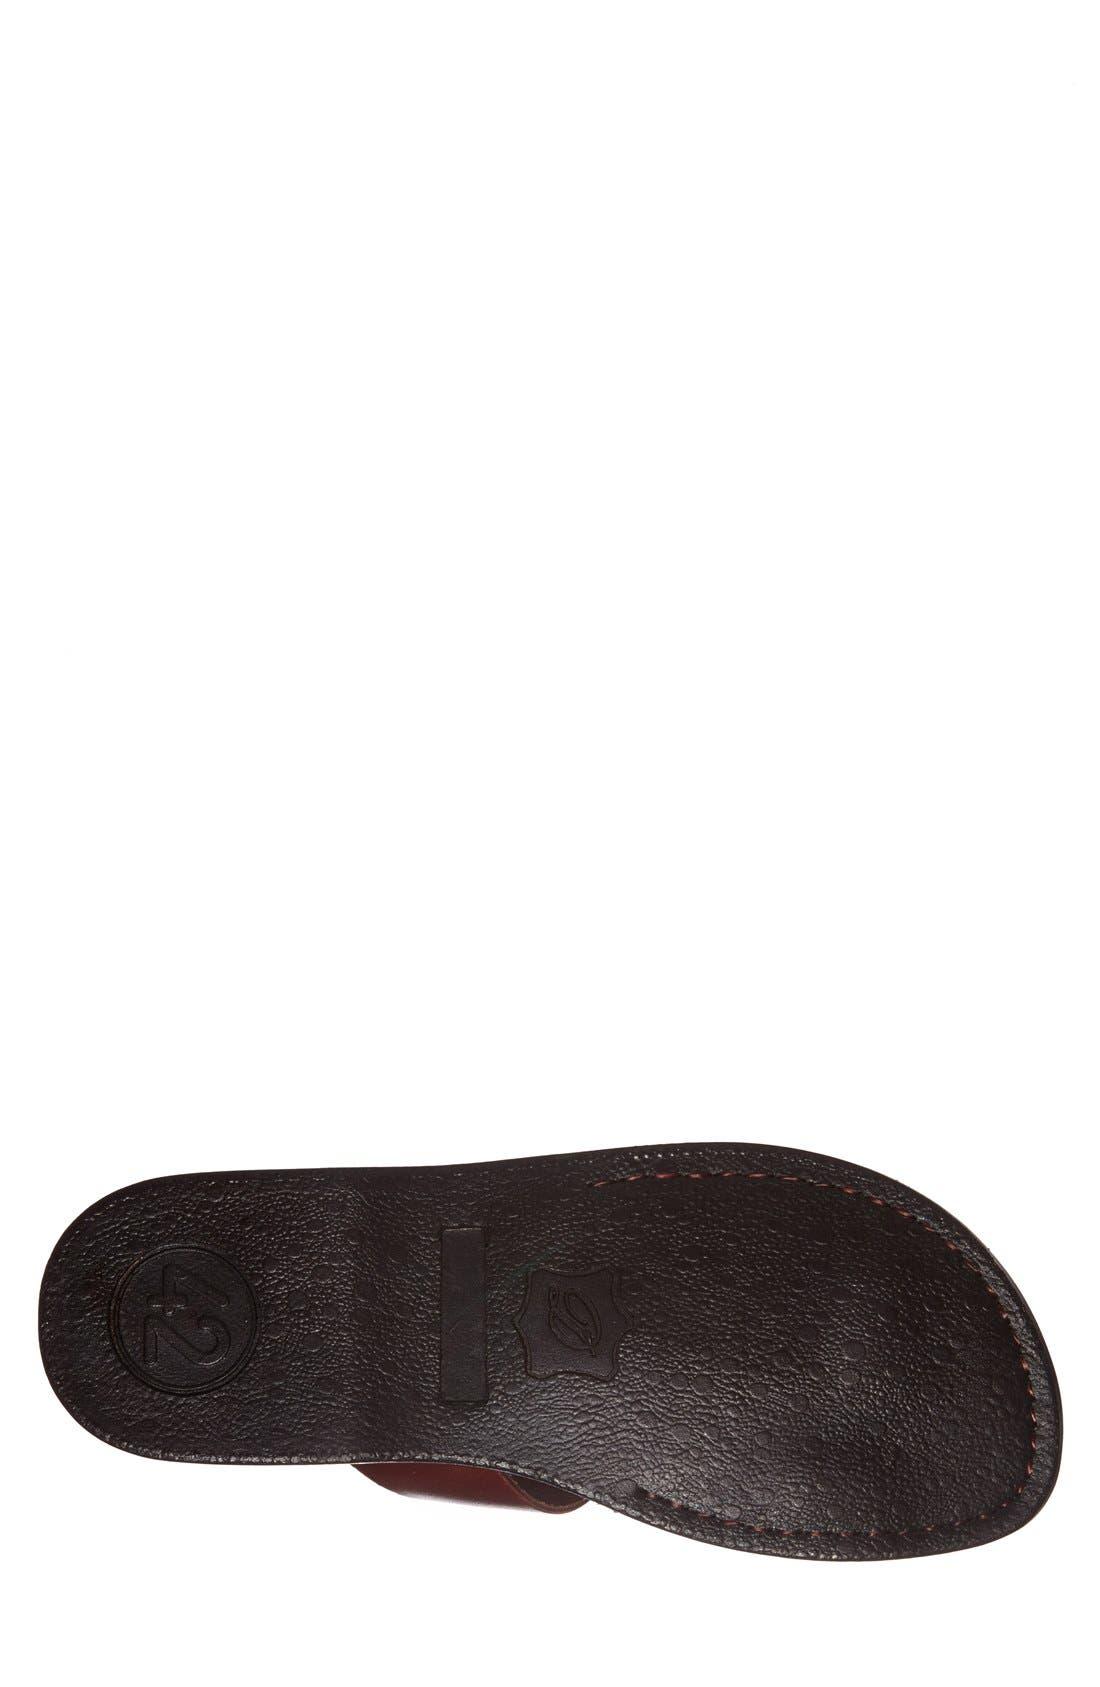 'Zohar' Leather Sandal,                             Alternate thumbnail 4, color,                             BROWN